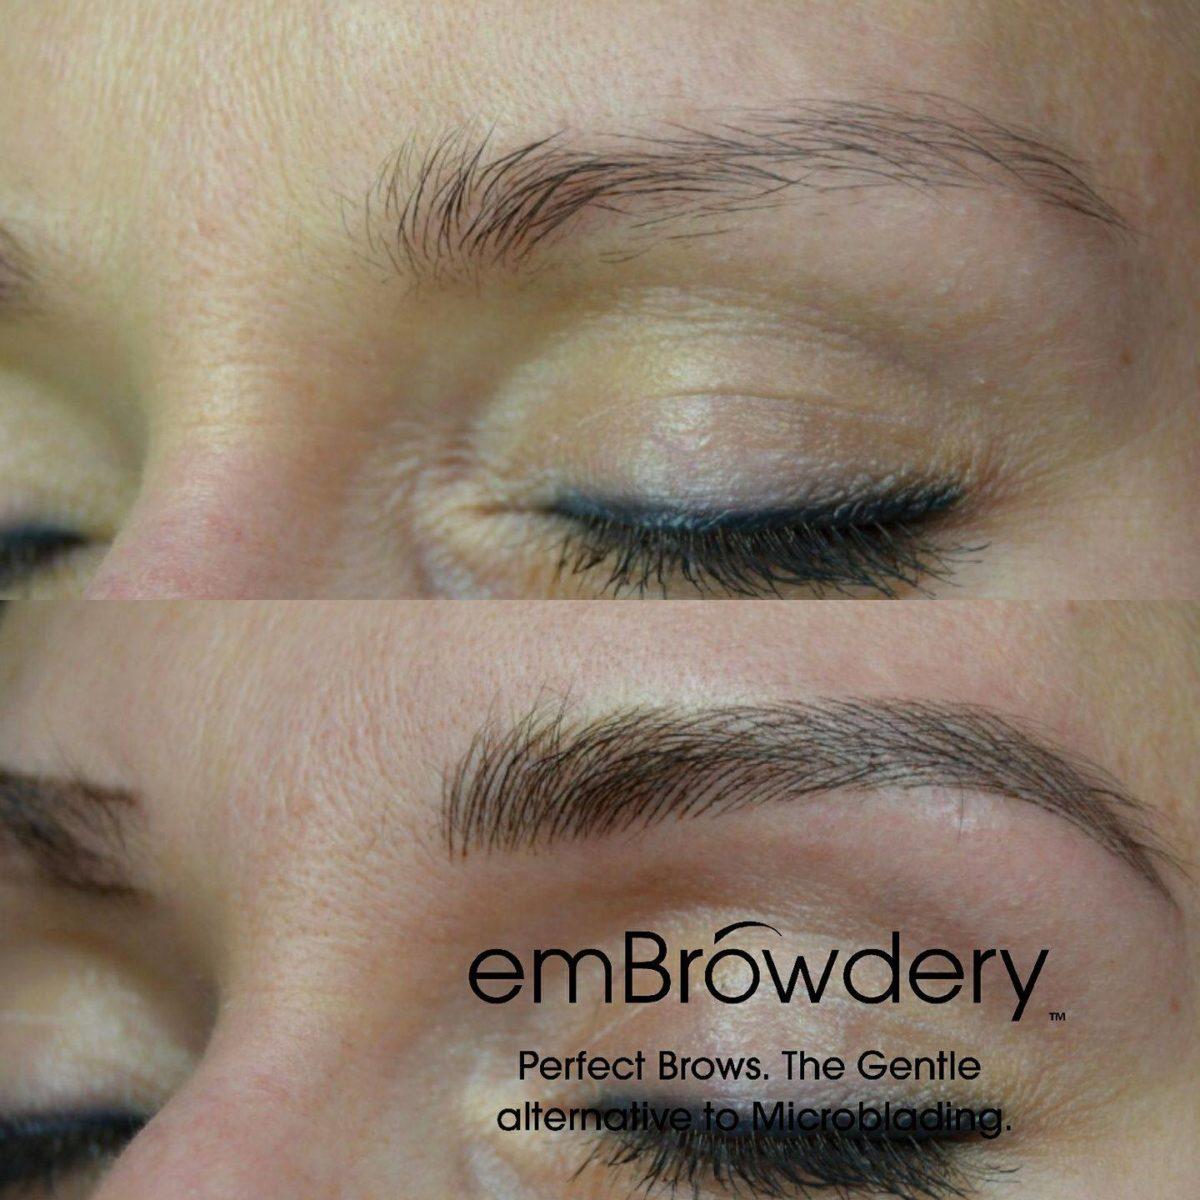 Phi Brows Embrowdery Lemons Hair Beauty Salon